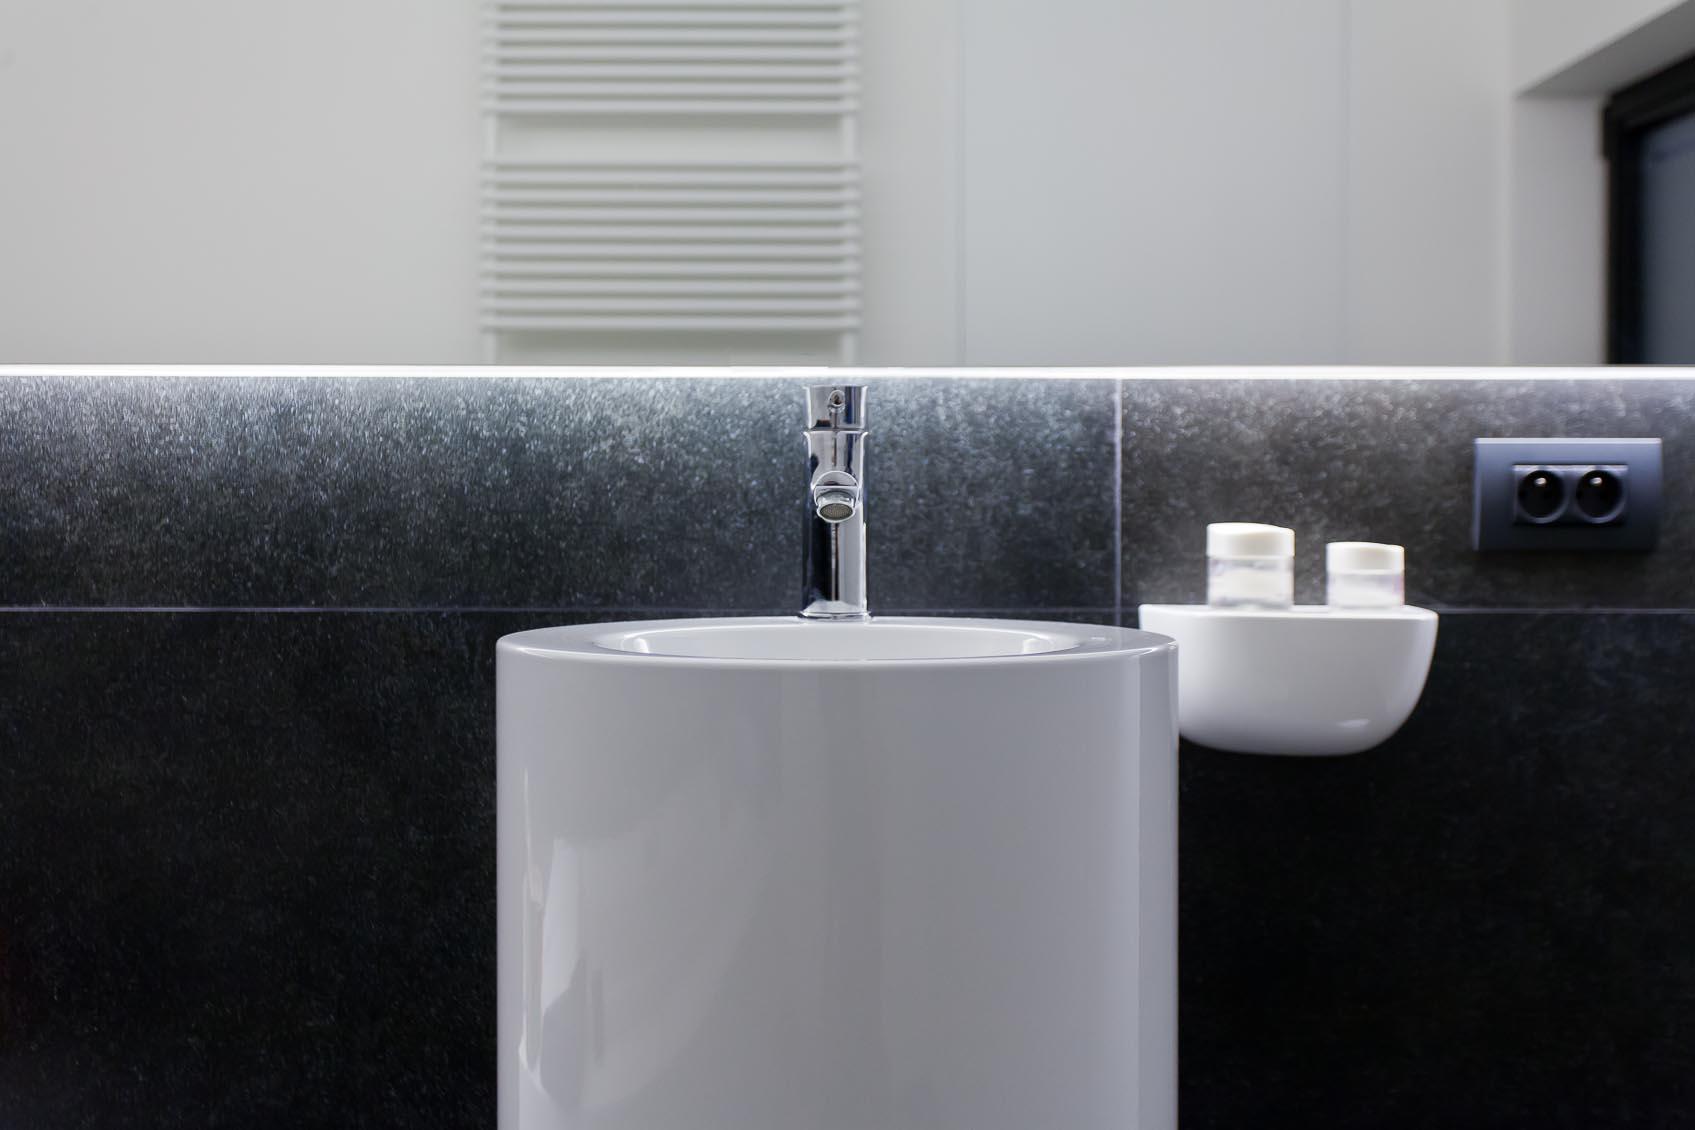 Badkamerkast Met Verlichting : Ikea badkamerkast met spiegel badkamer lampjes best philips